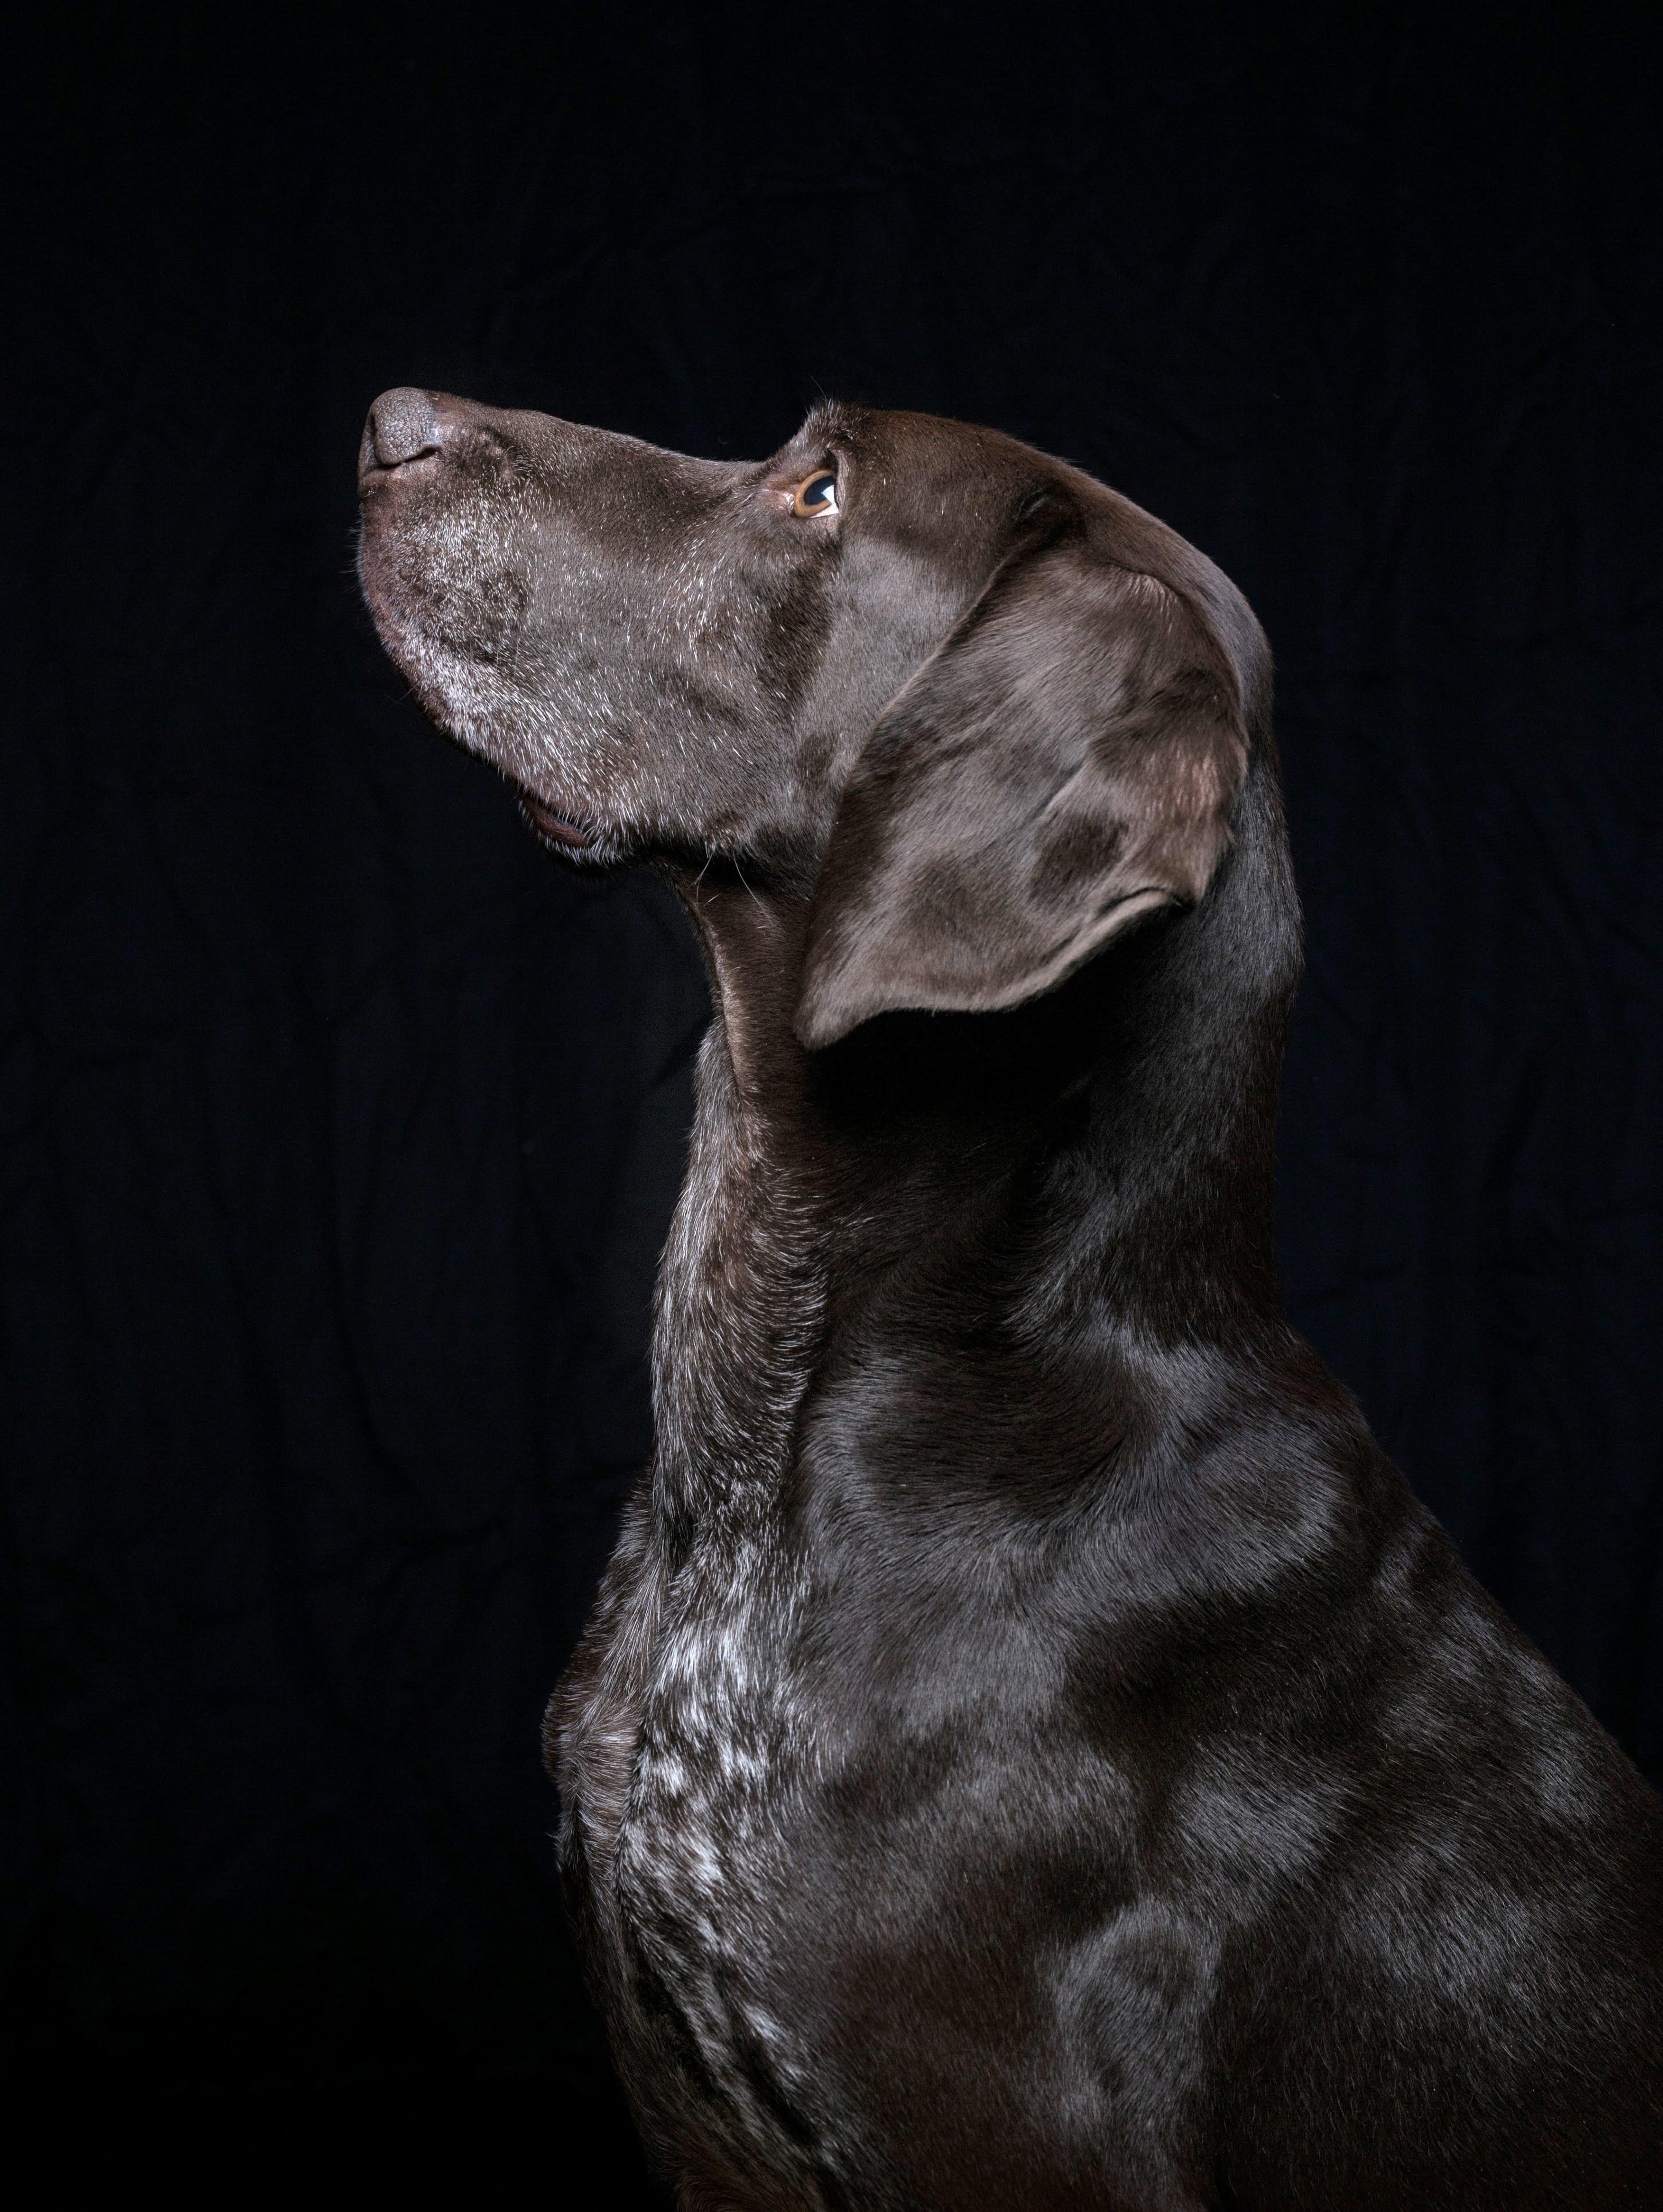 106498 download wallpaper Animals, Black Labrador, Labrador, Dog, Pet screensavers and pictures for free